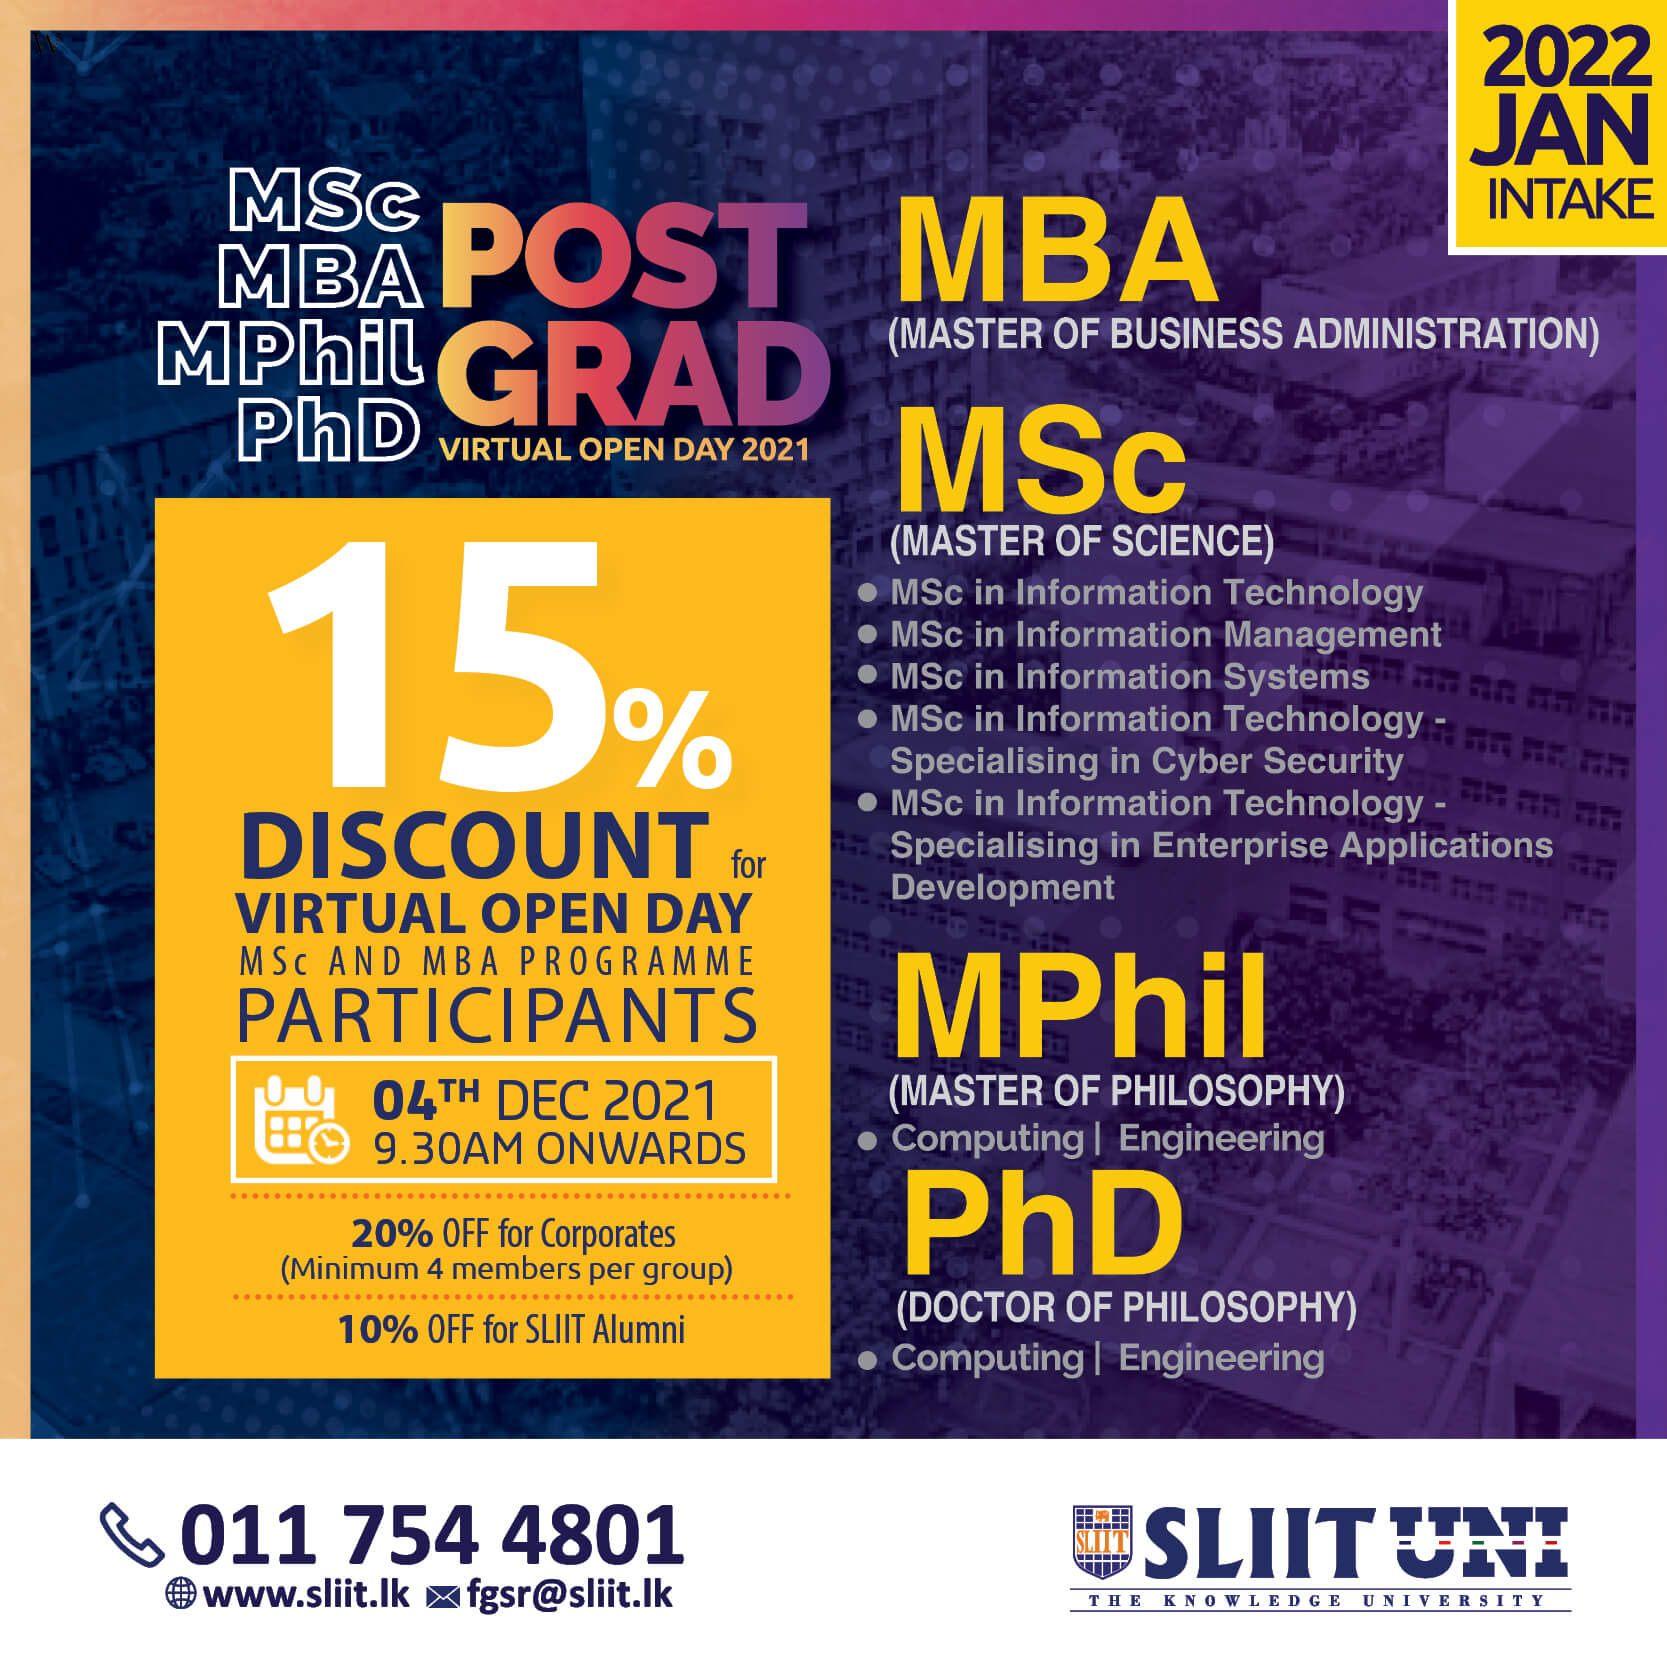 Postgraduate Studies & Research Programmes @ SLIIT